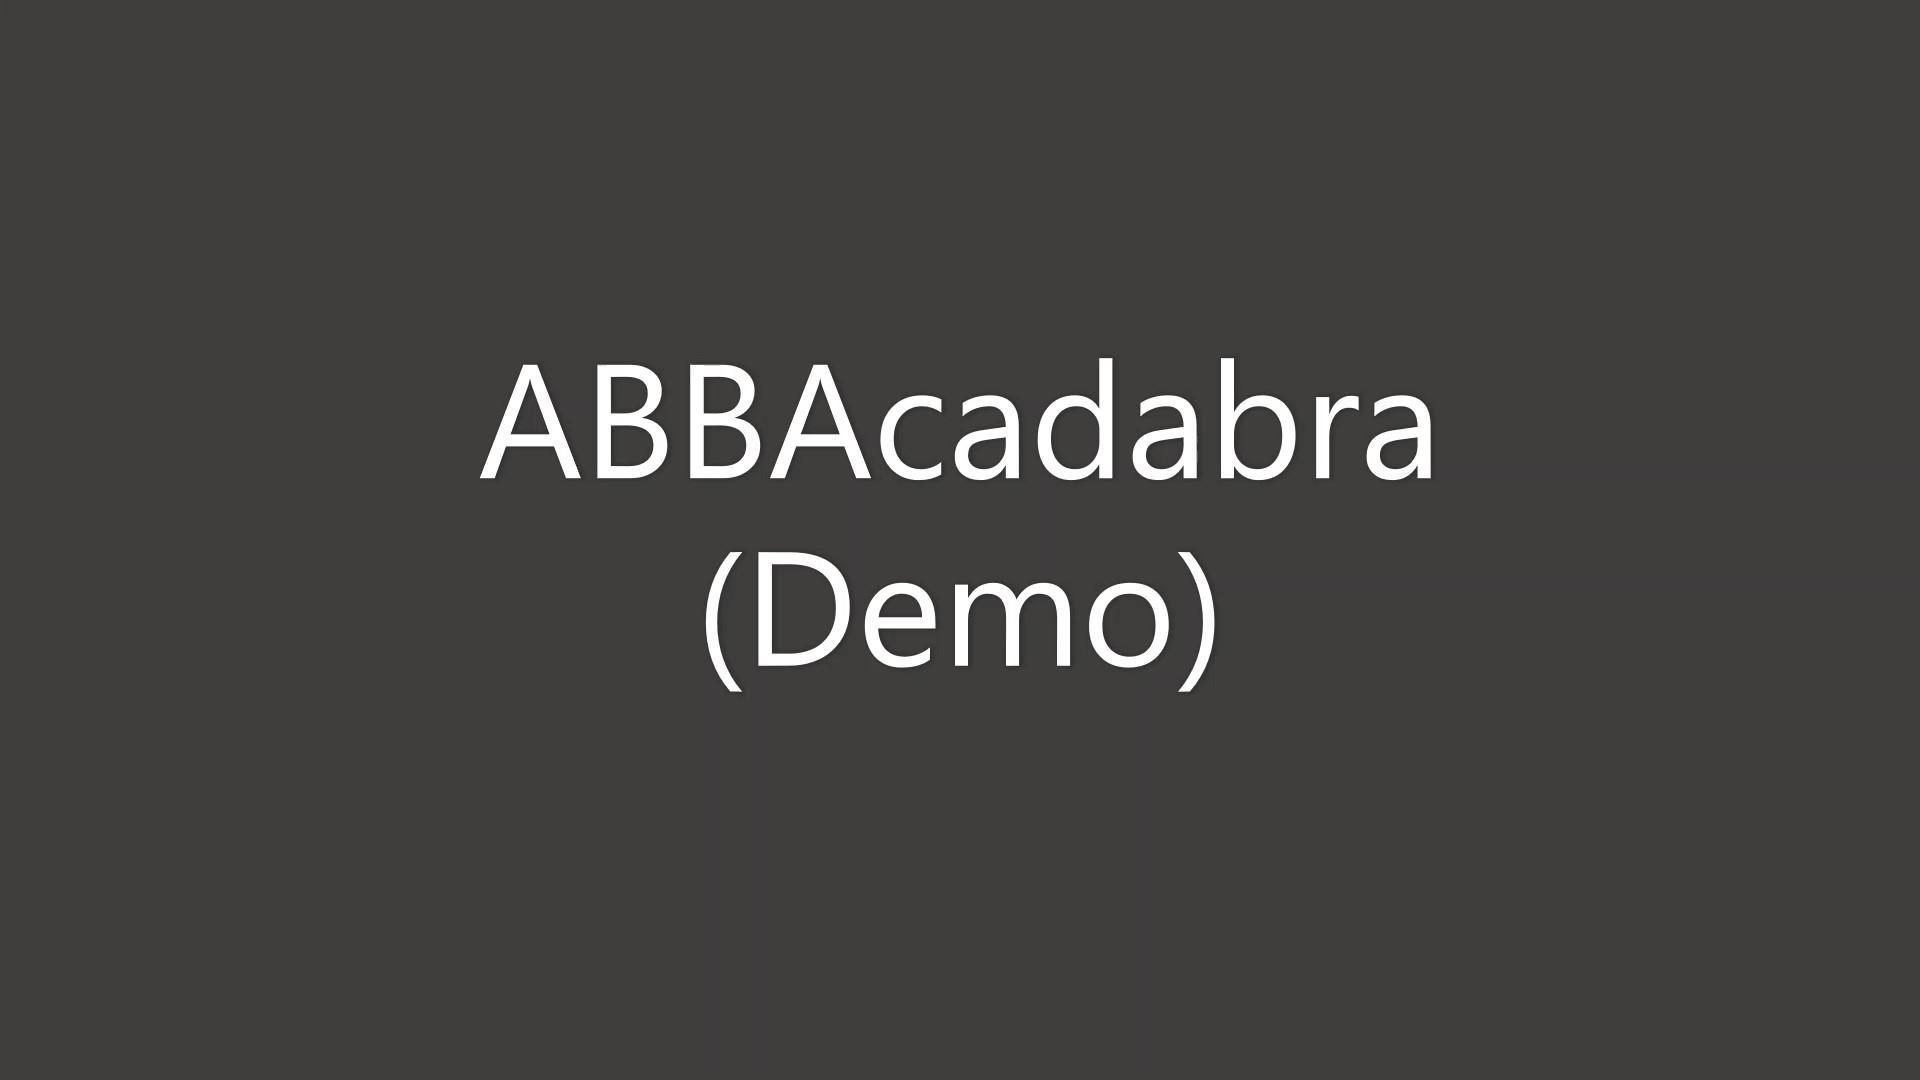 ABBAcadabra Demo